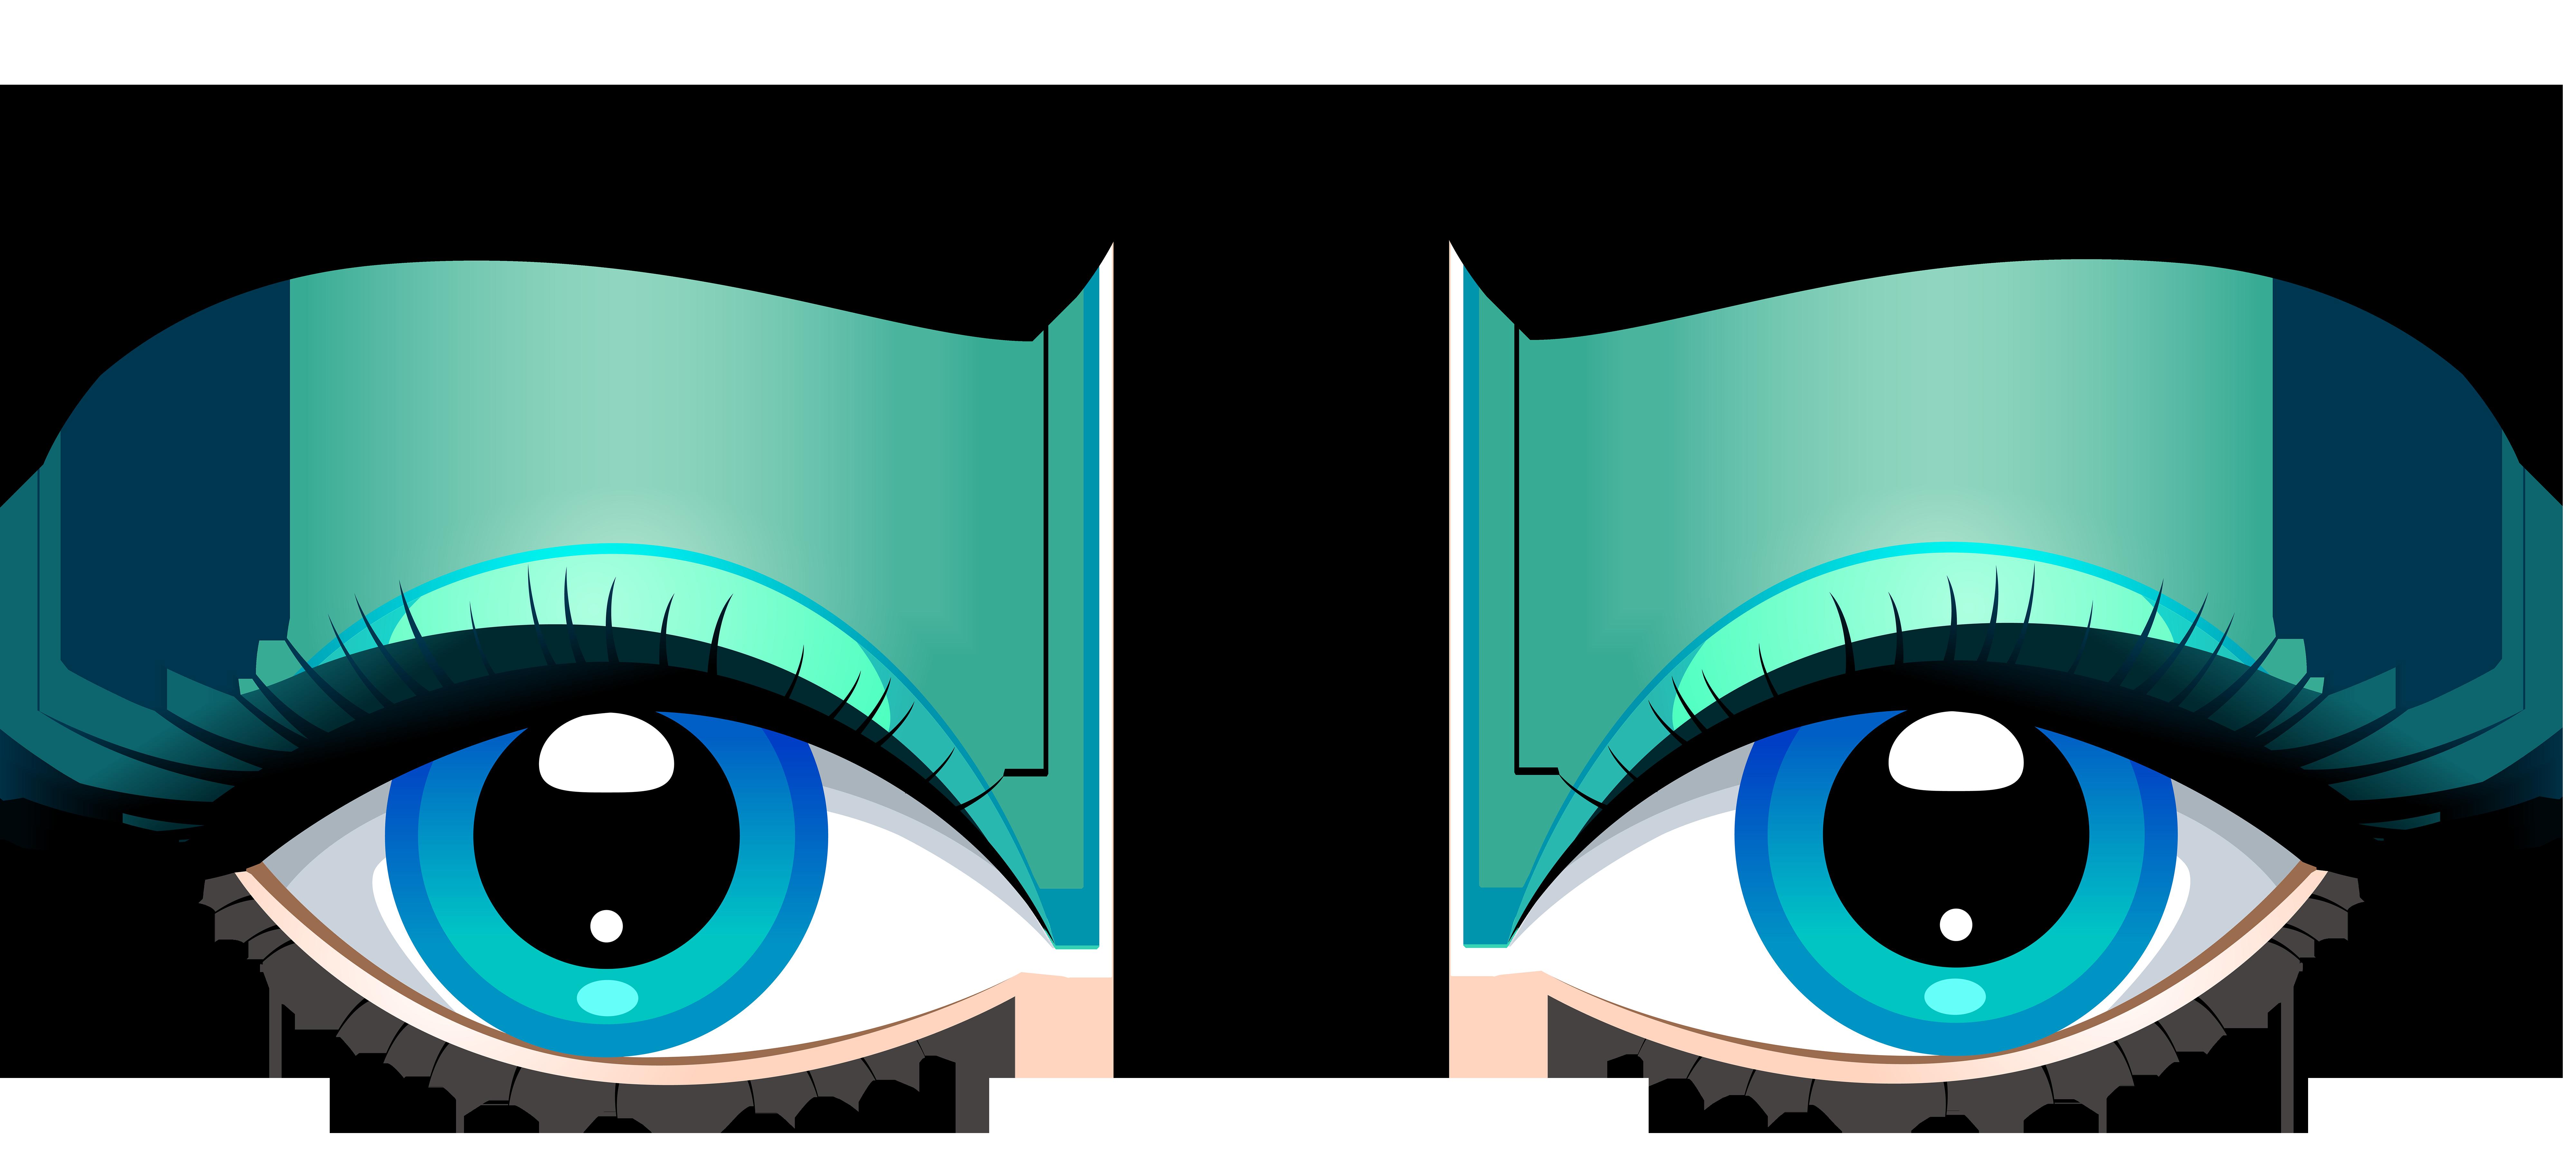 Happy Cartoon Eyes With Eyelashes download Cartoon eyes